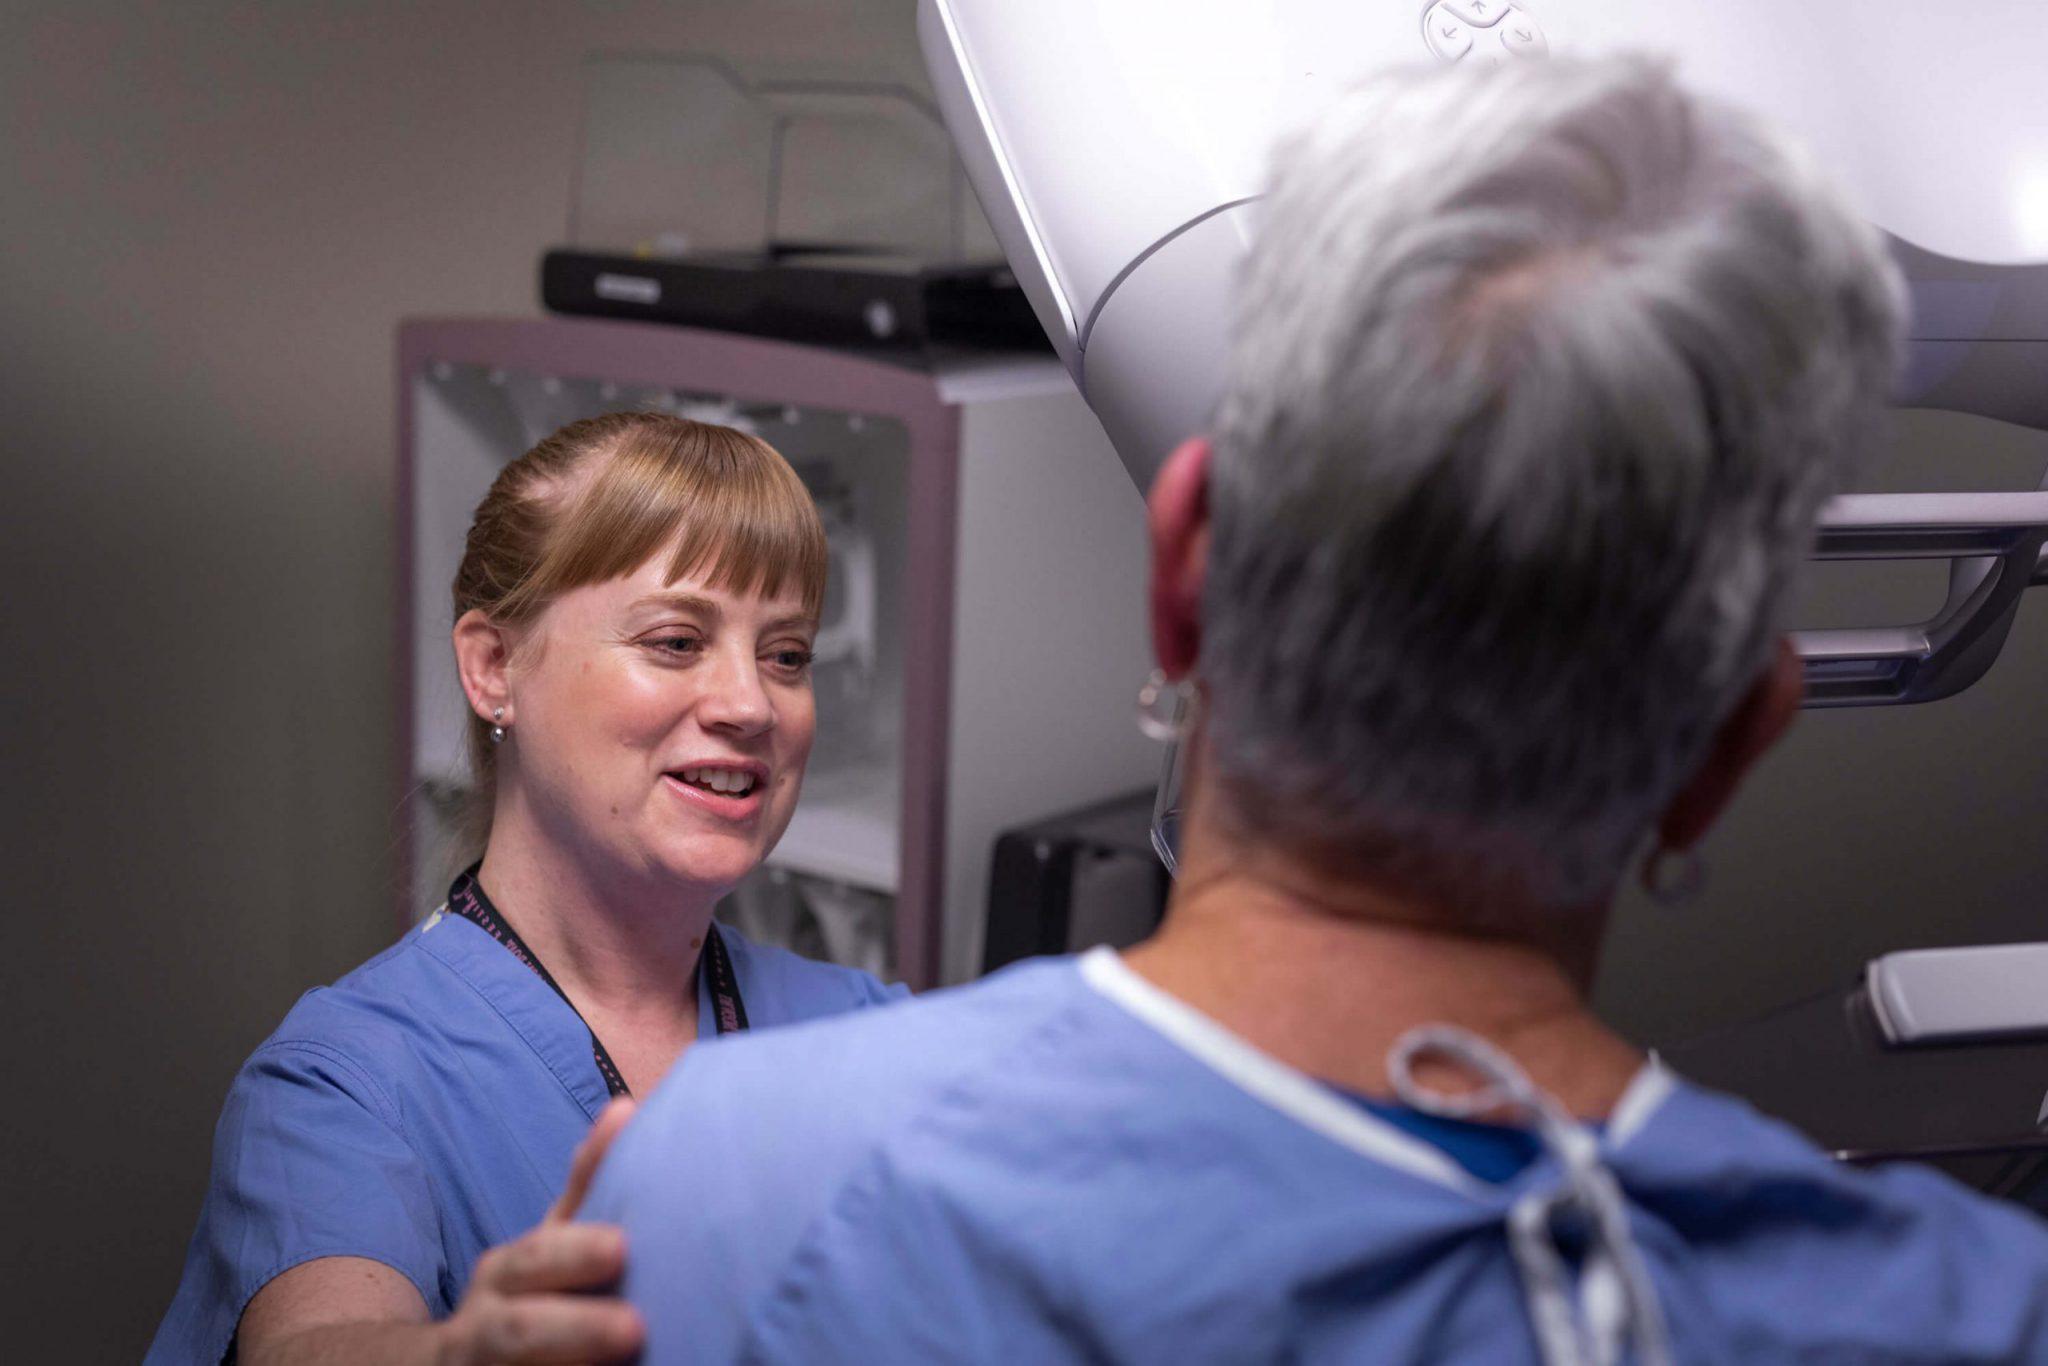 Nurse supporting patient through mammogram screening